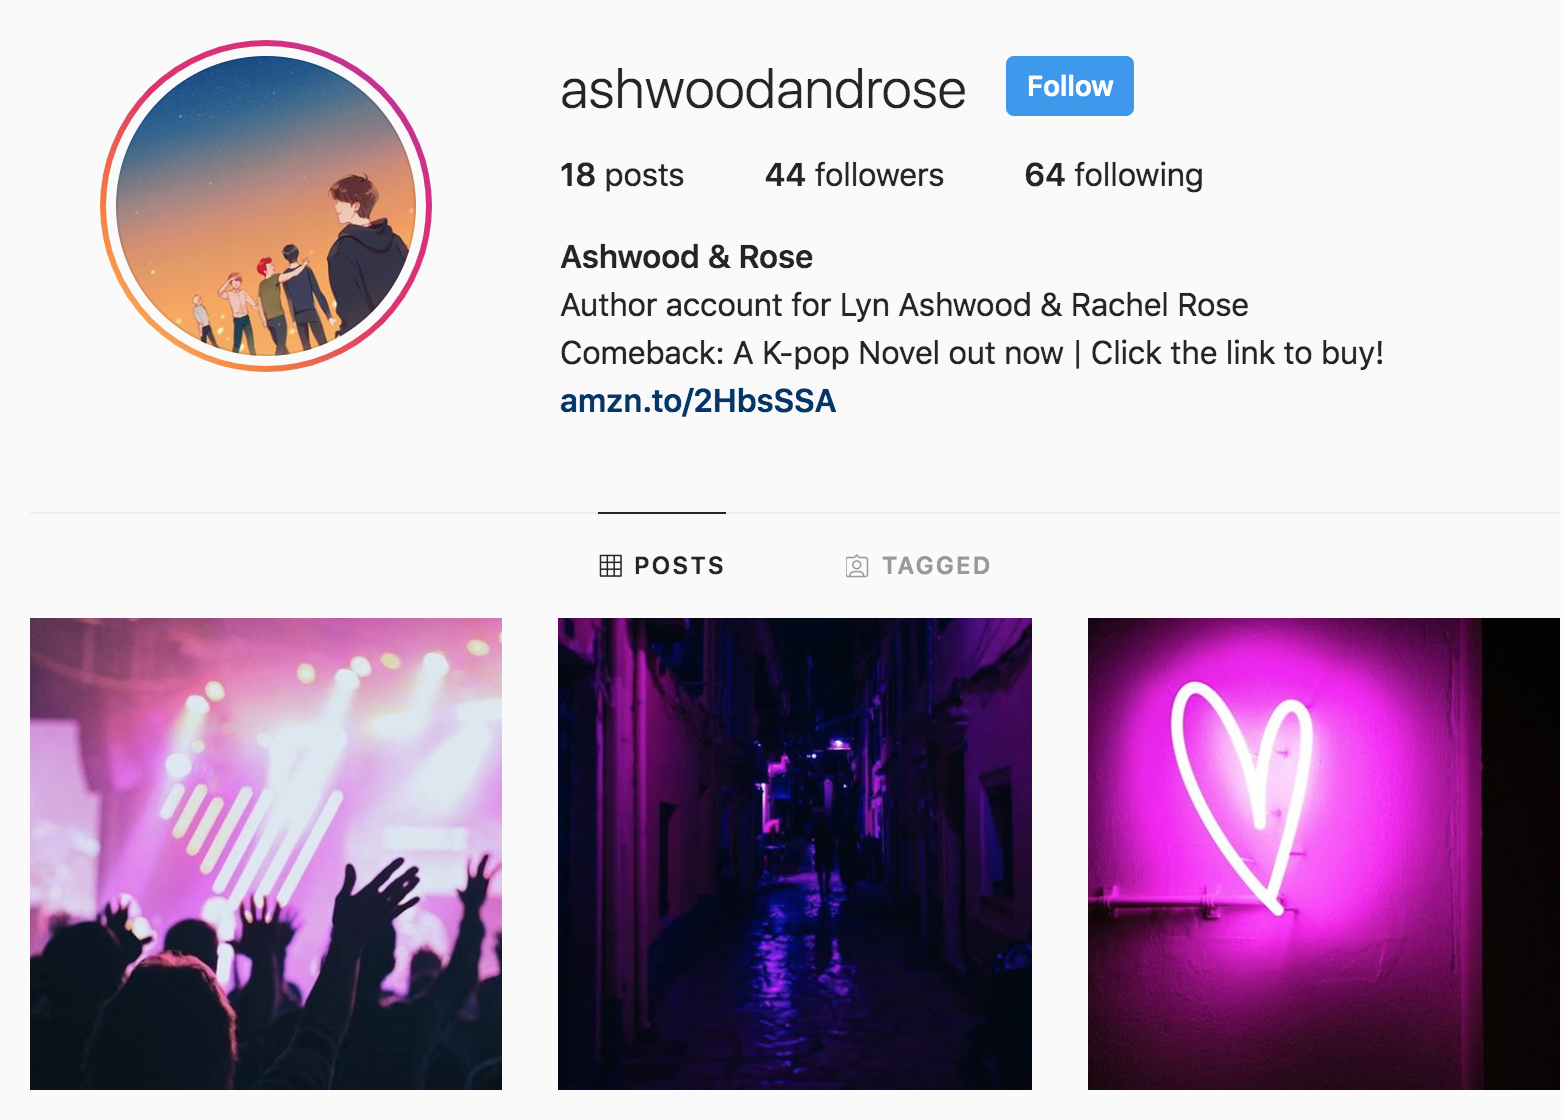 kpop novel – Ashwood and Rose